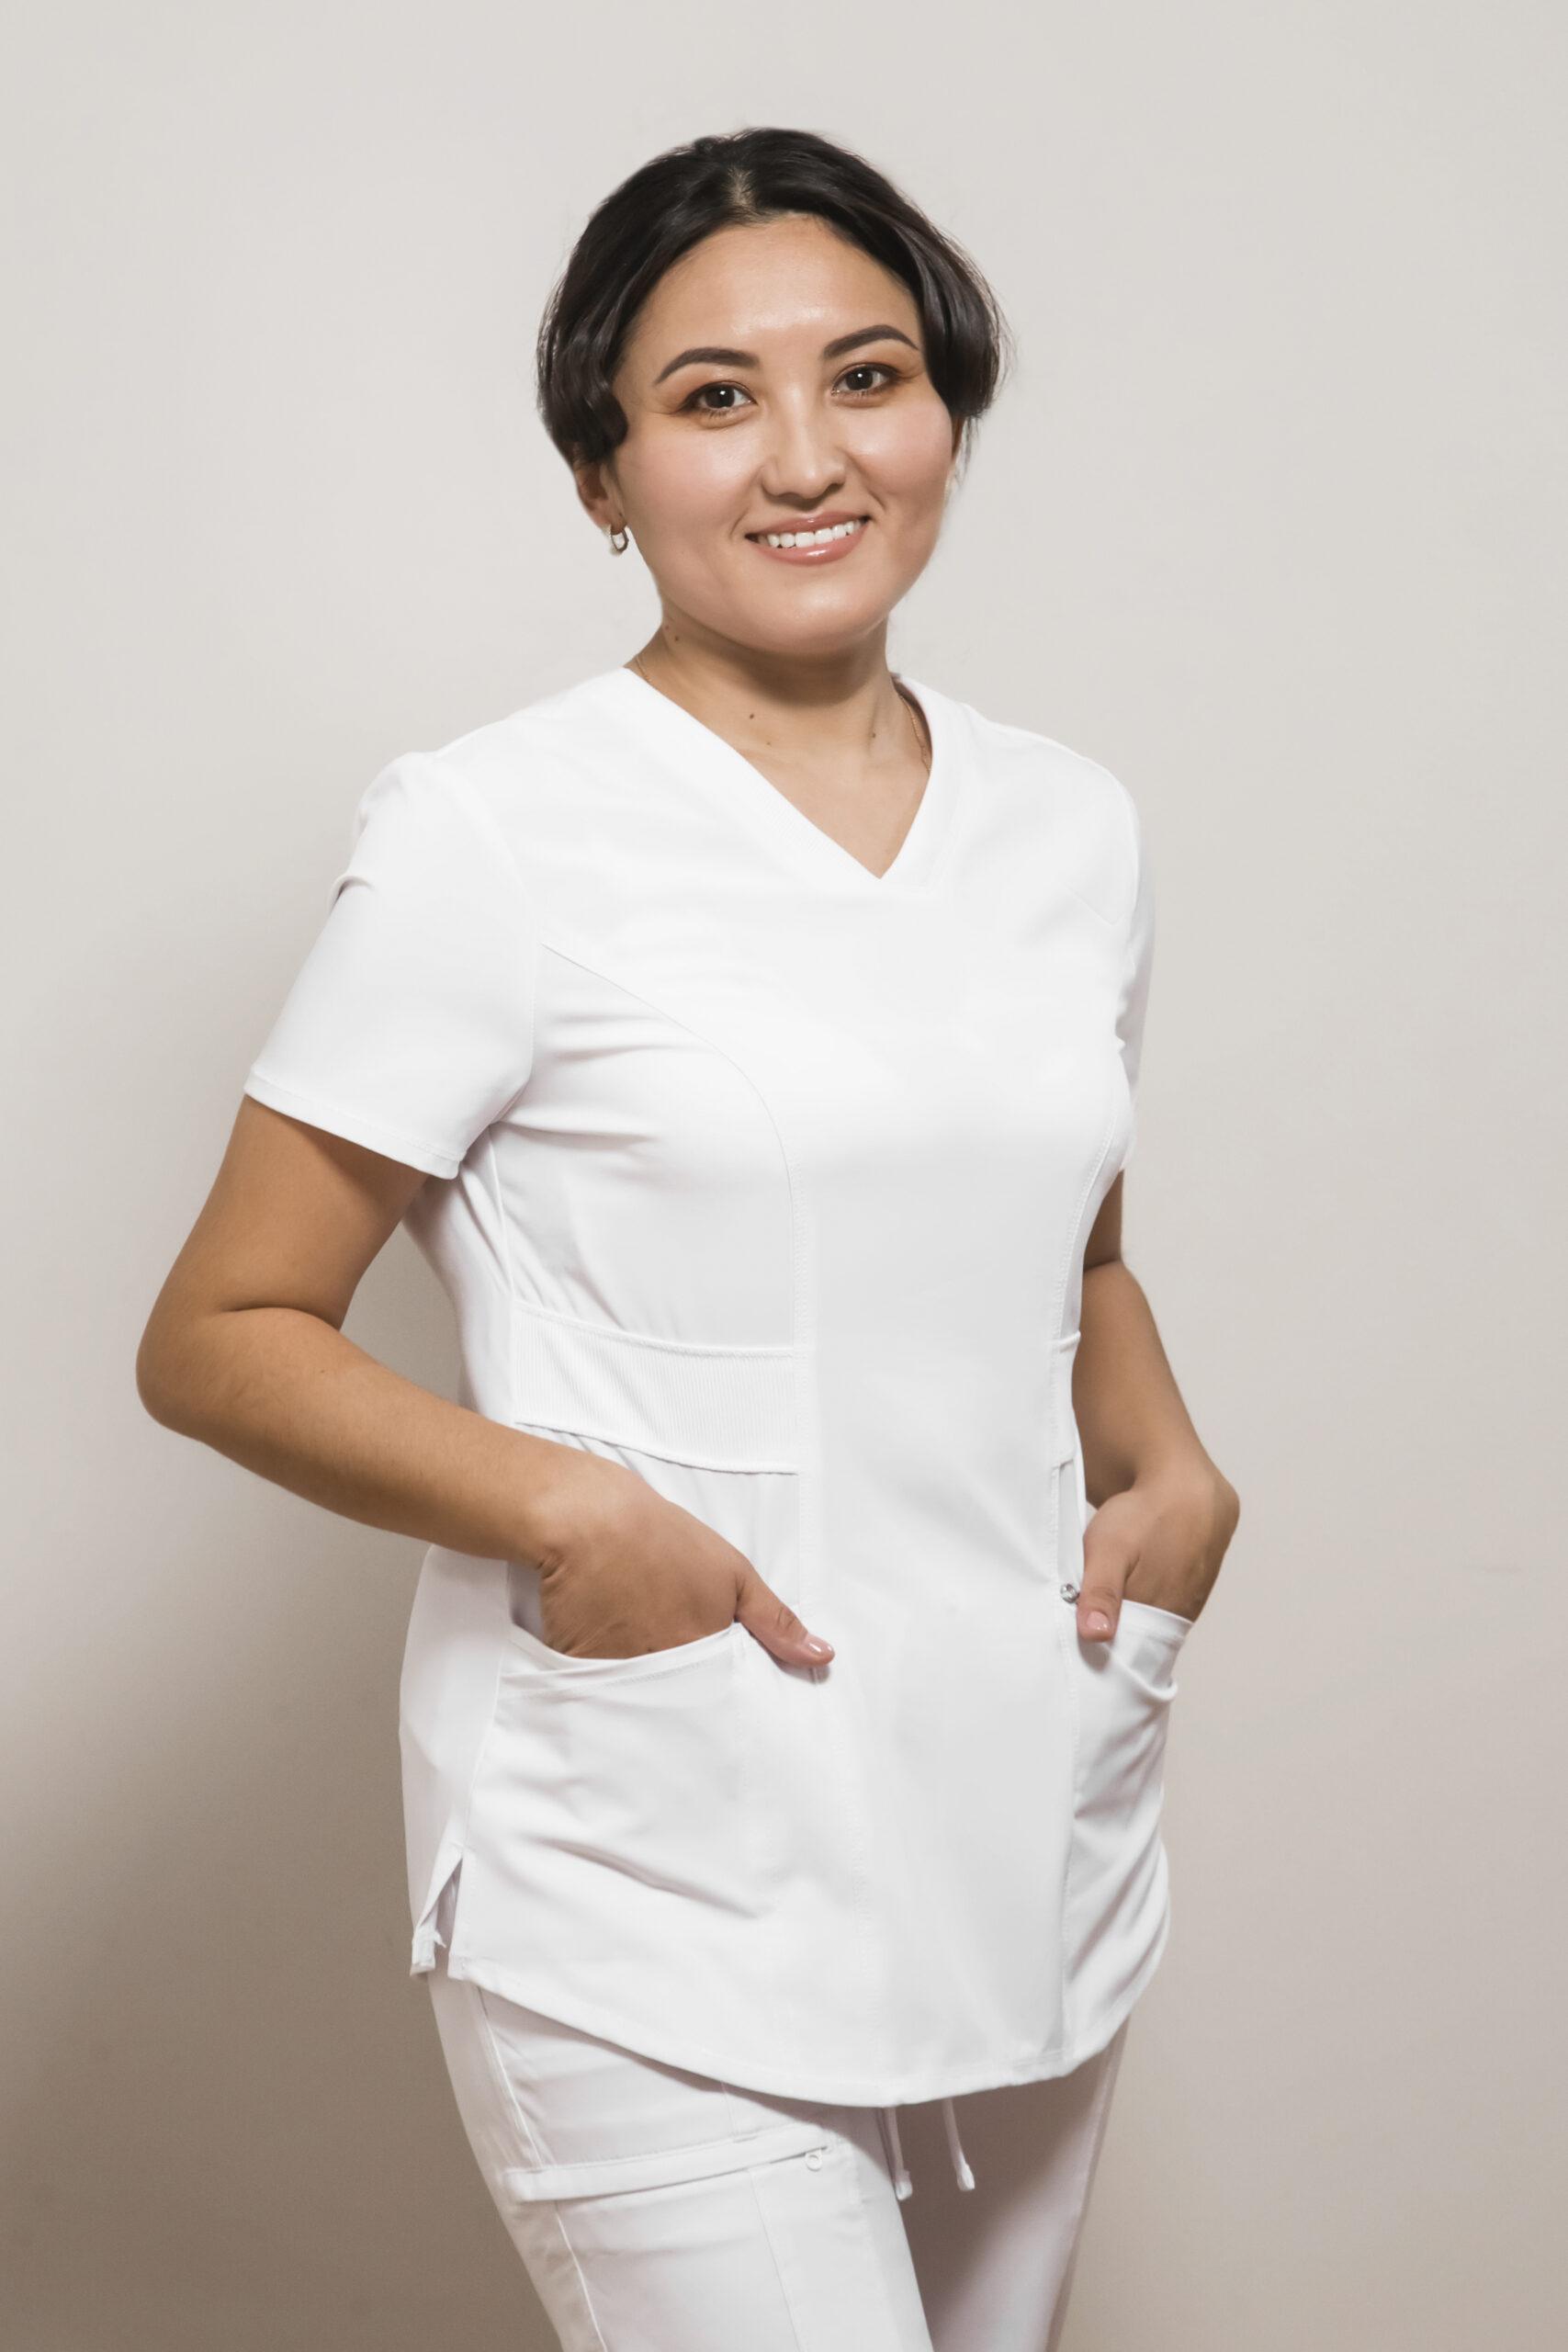 Джапарова Сандугаш Сарсенбаевна